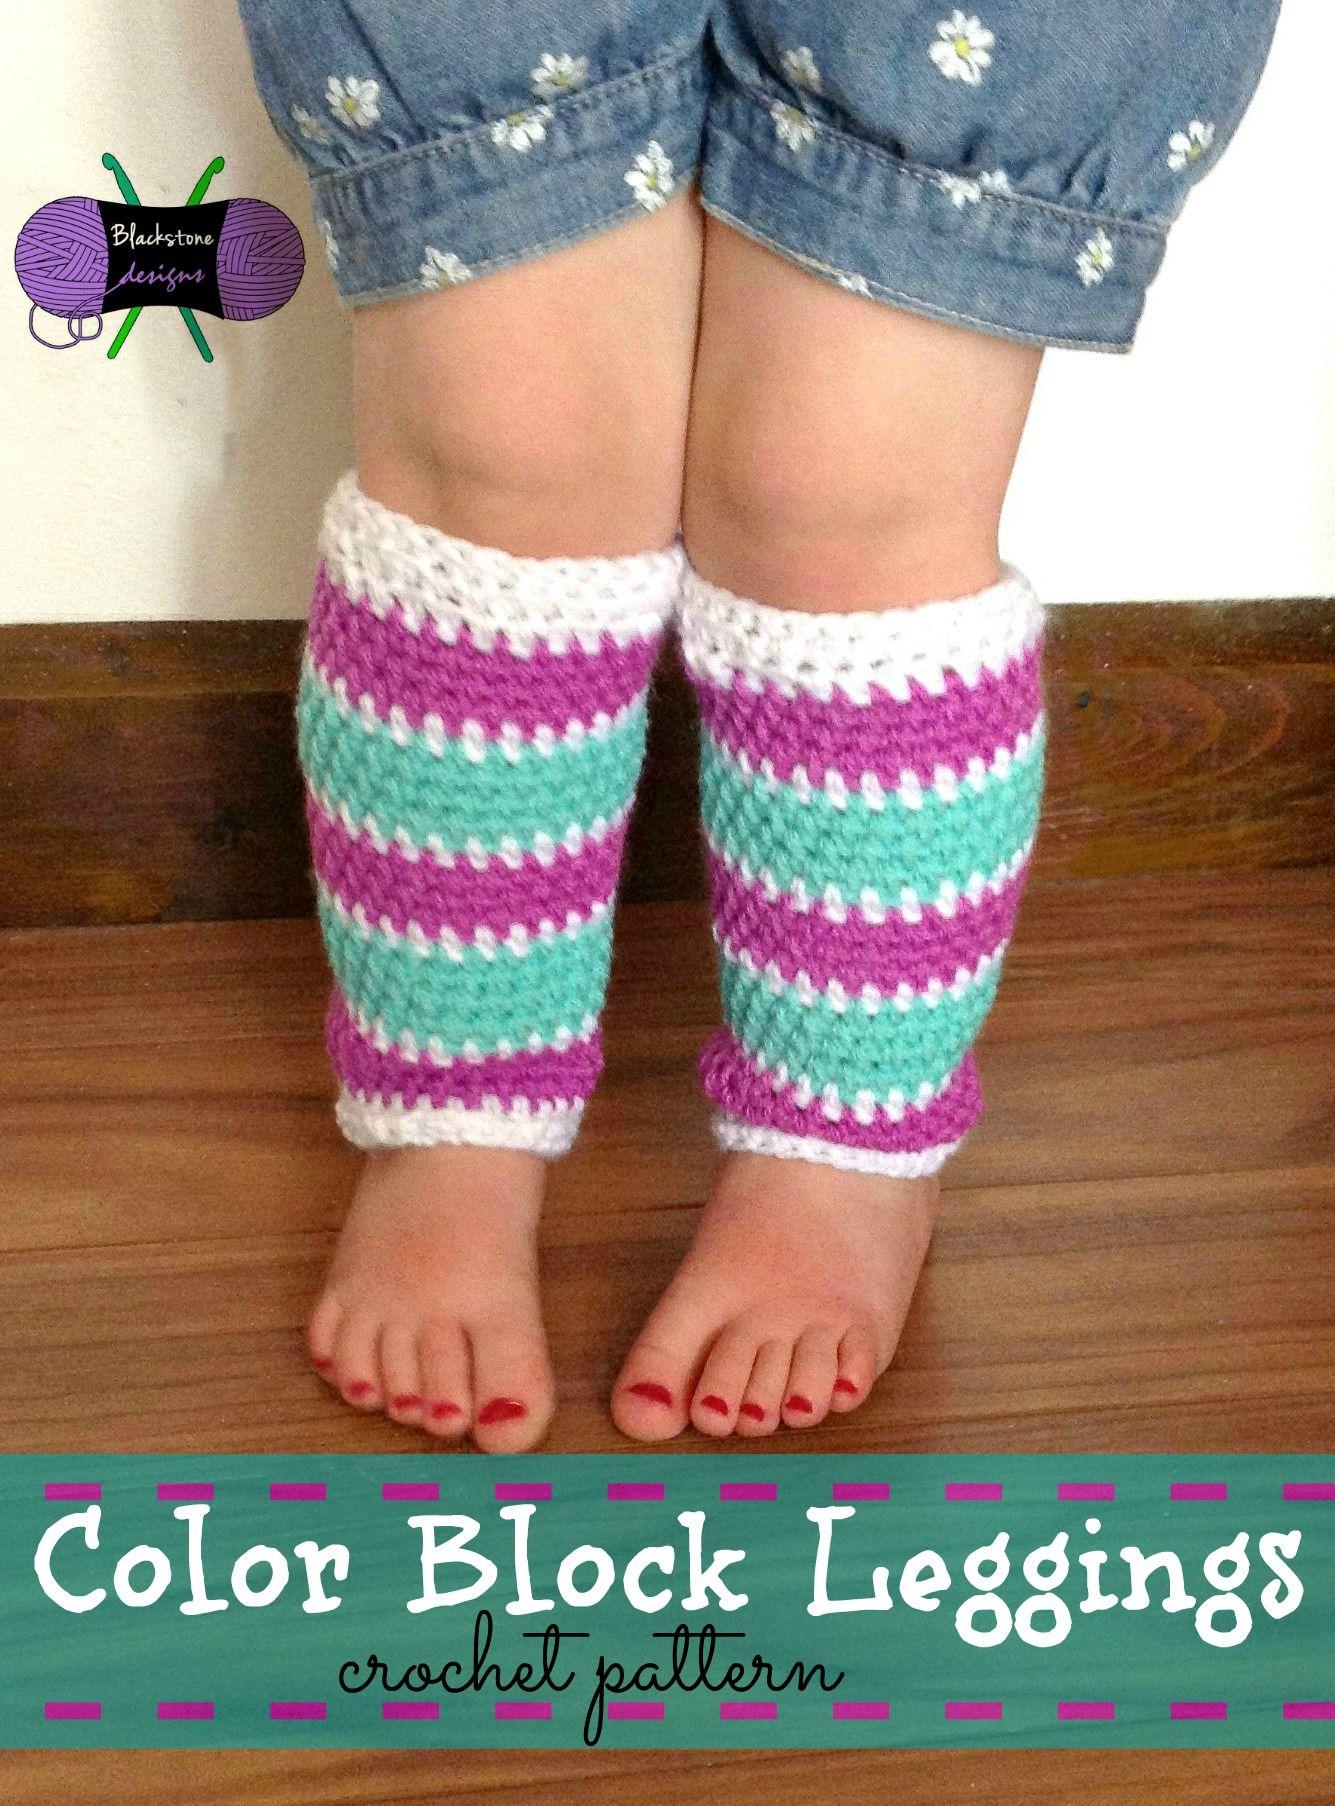 Color block leggings pattern by sonya blackstone pattern library color block leggings pattern by sonya blackstone bankloansurffo Image collections